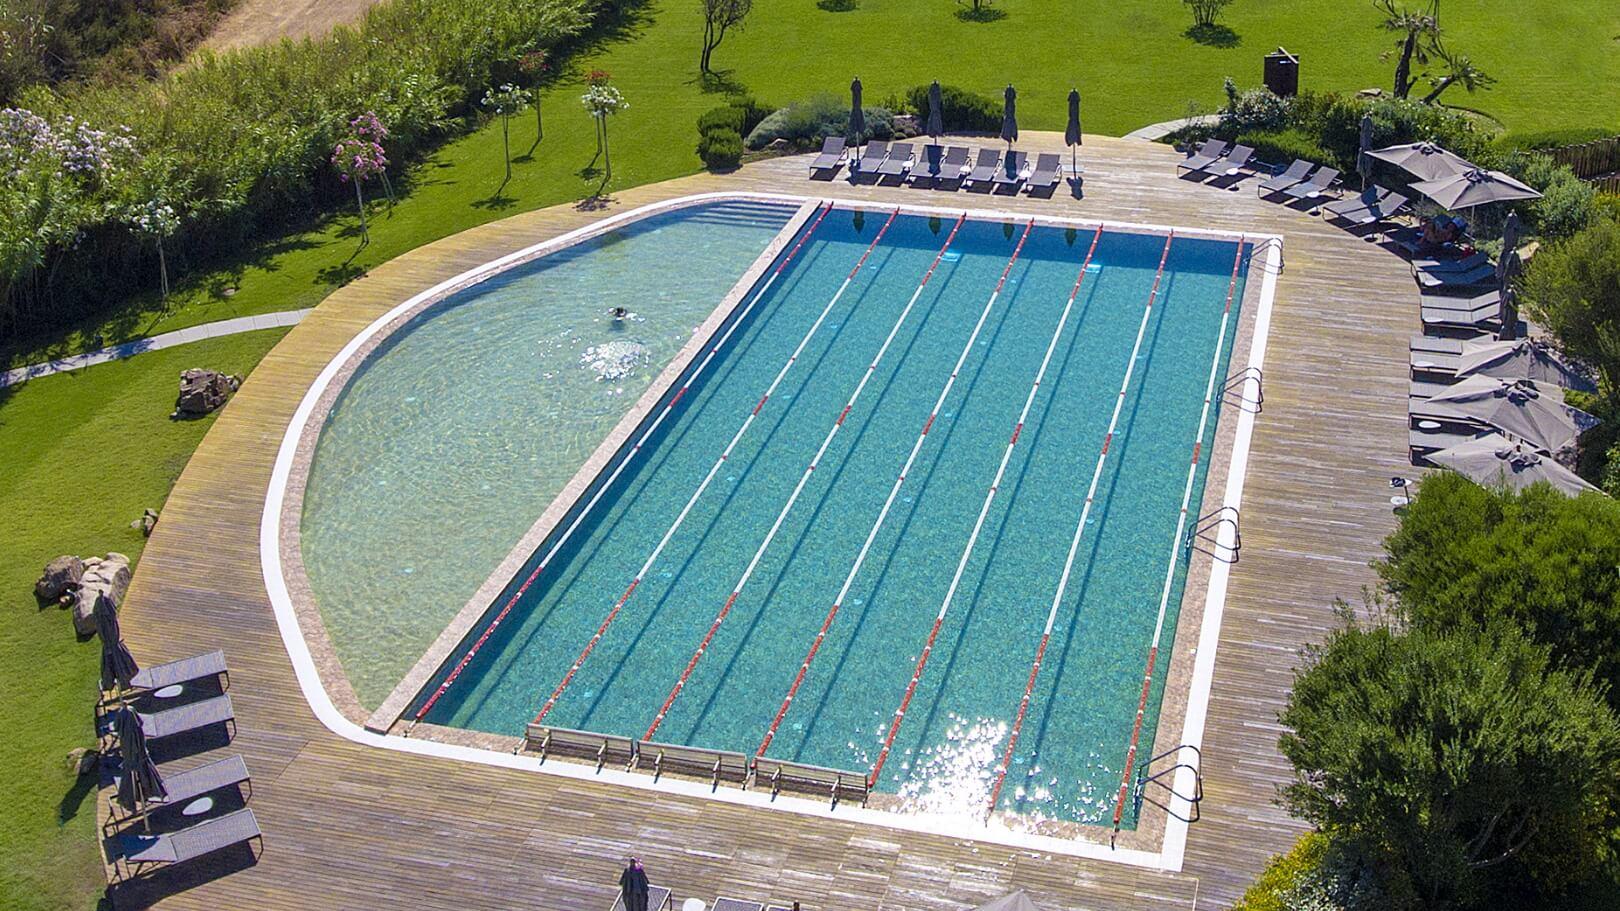 https://www.chialagunaresort.com/wp-content/uploads/2021/05/IHC_Chia-Laguna-Resort_grid_CL4U_pool.jpg